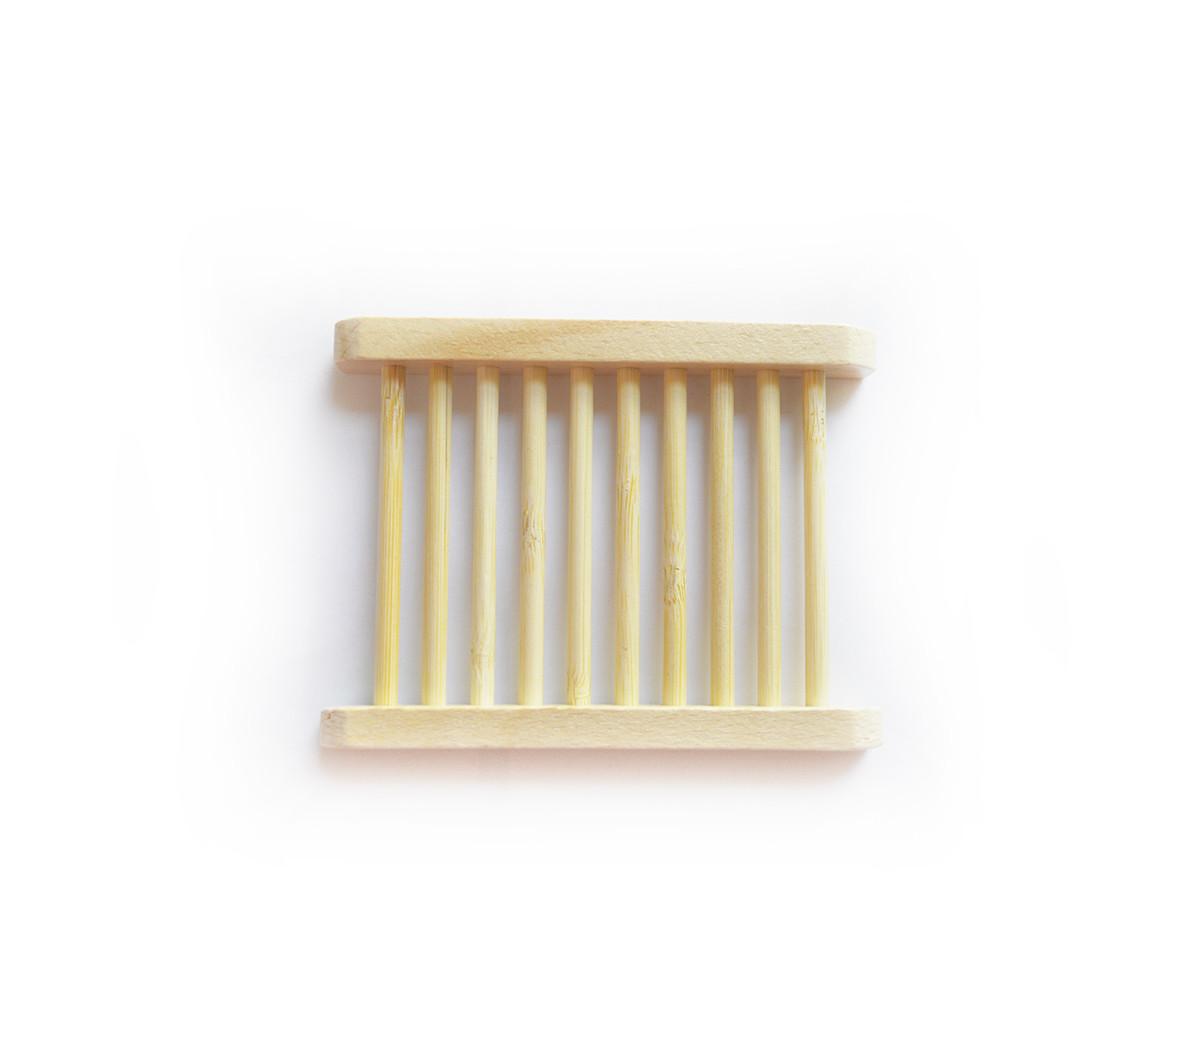 Simply Good™ Wood self-draining soap dish - holder for handmade soap